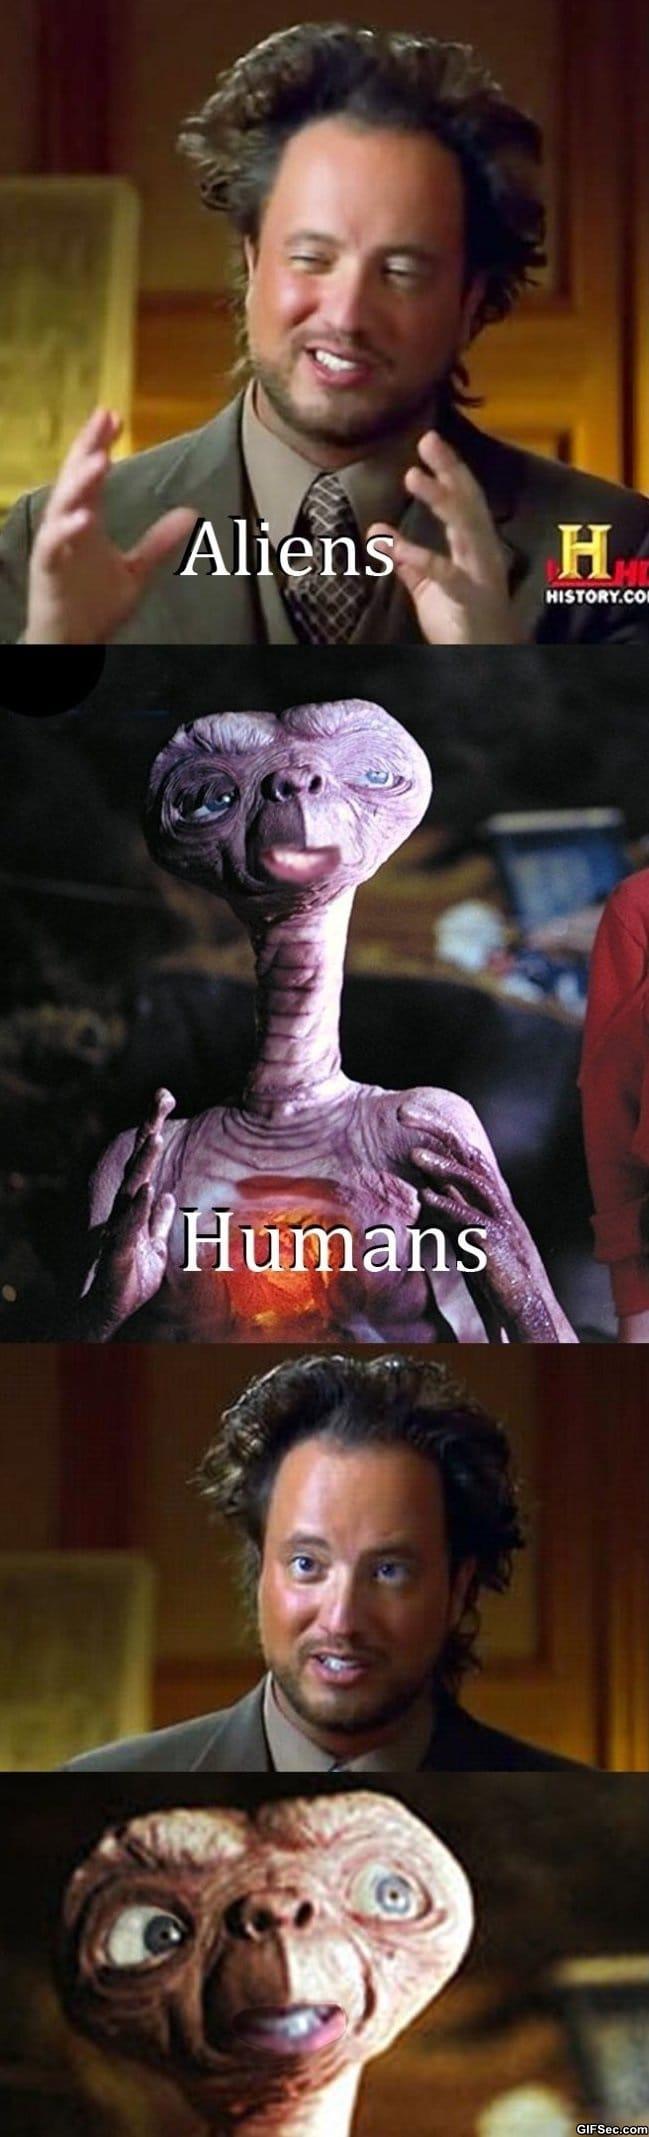 aliens-vs-humans